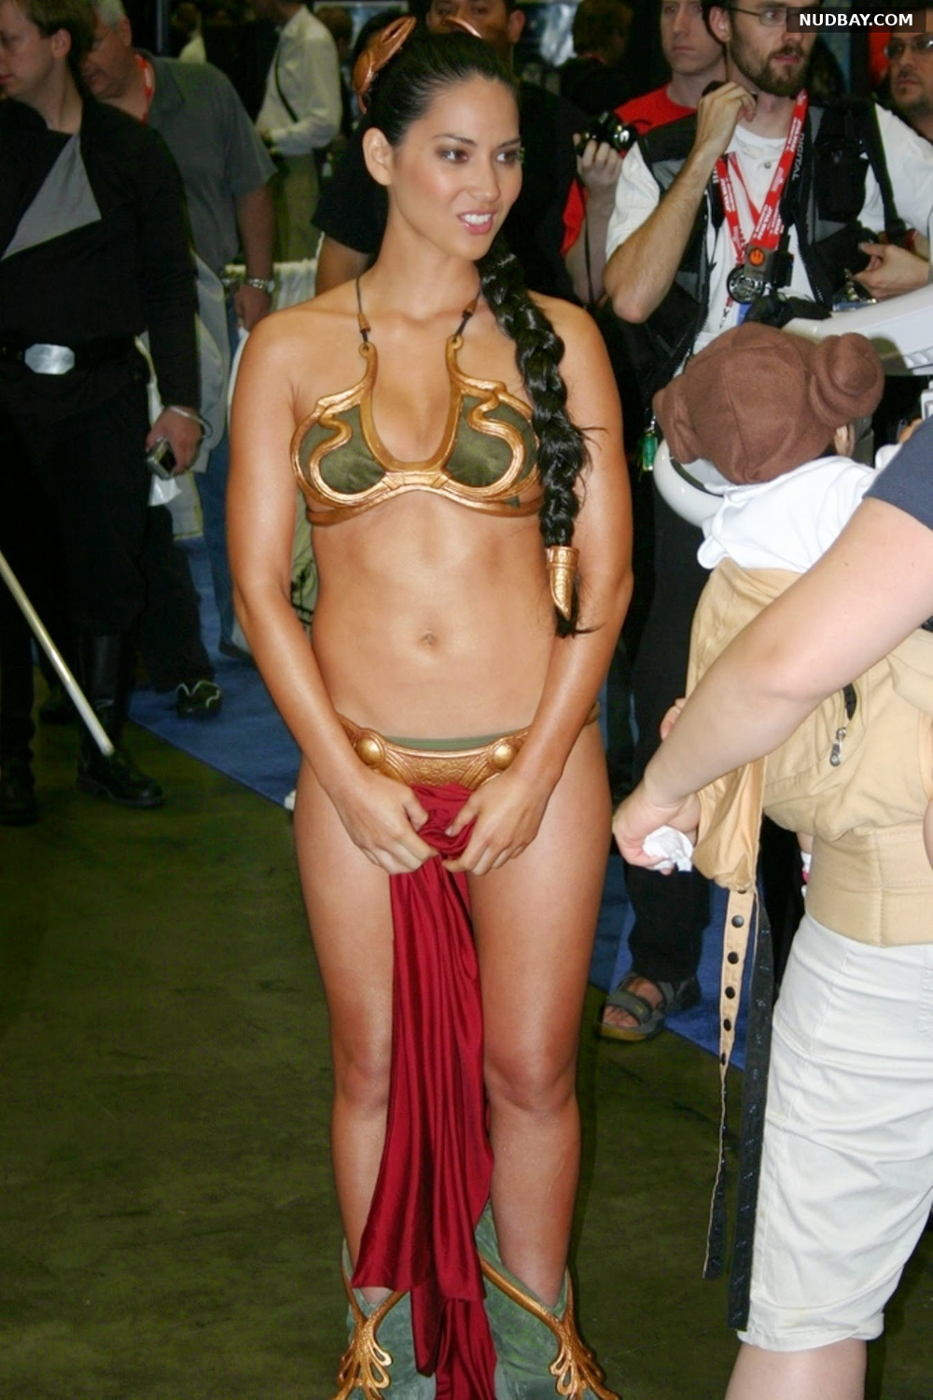 Olivia Munn nude at the 30th anniversary of Star Wars 2007